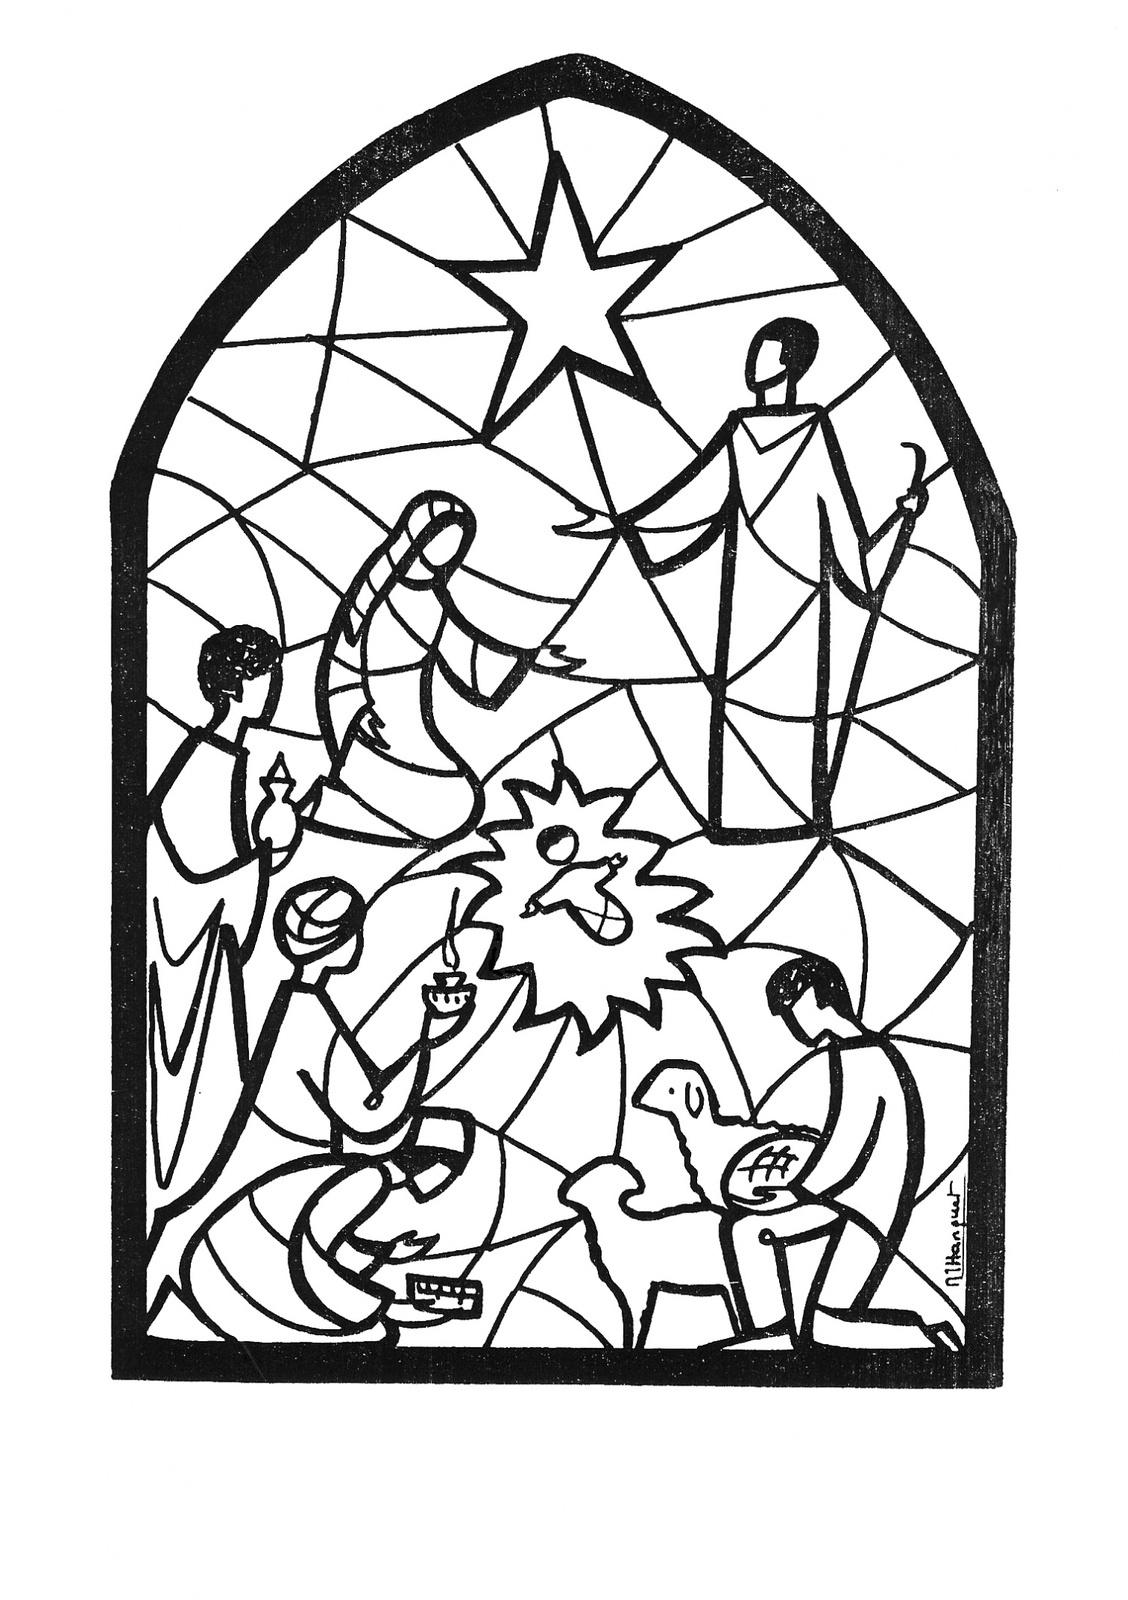 Ob 83ecf3 coloriage creche de noel nativite enfant jesus - Creche de noel a imprimer ...